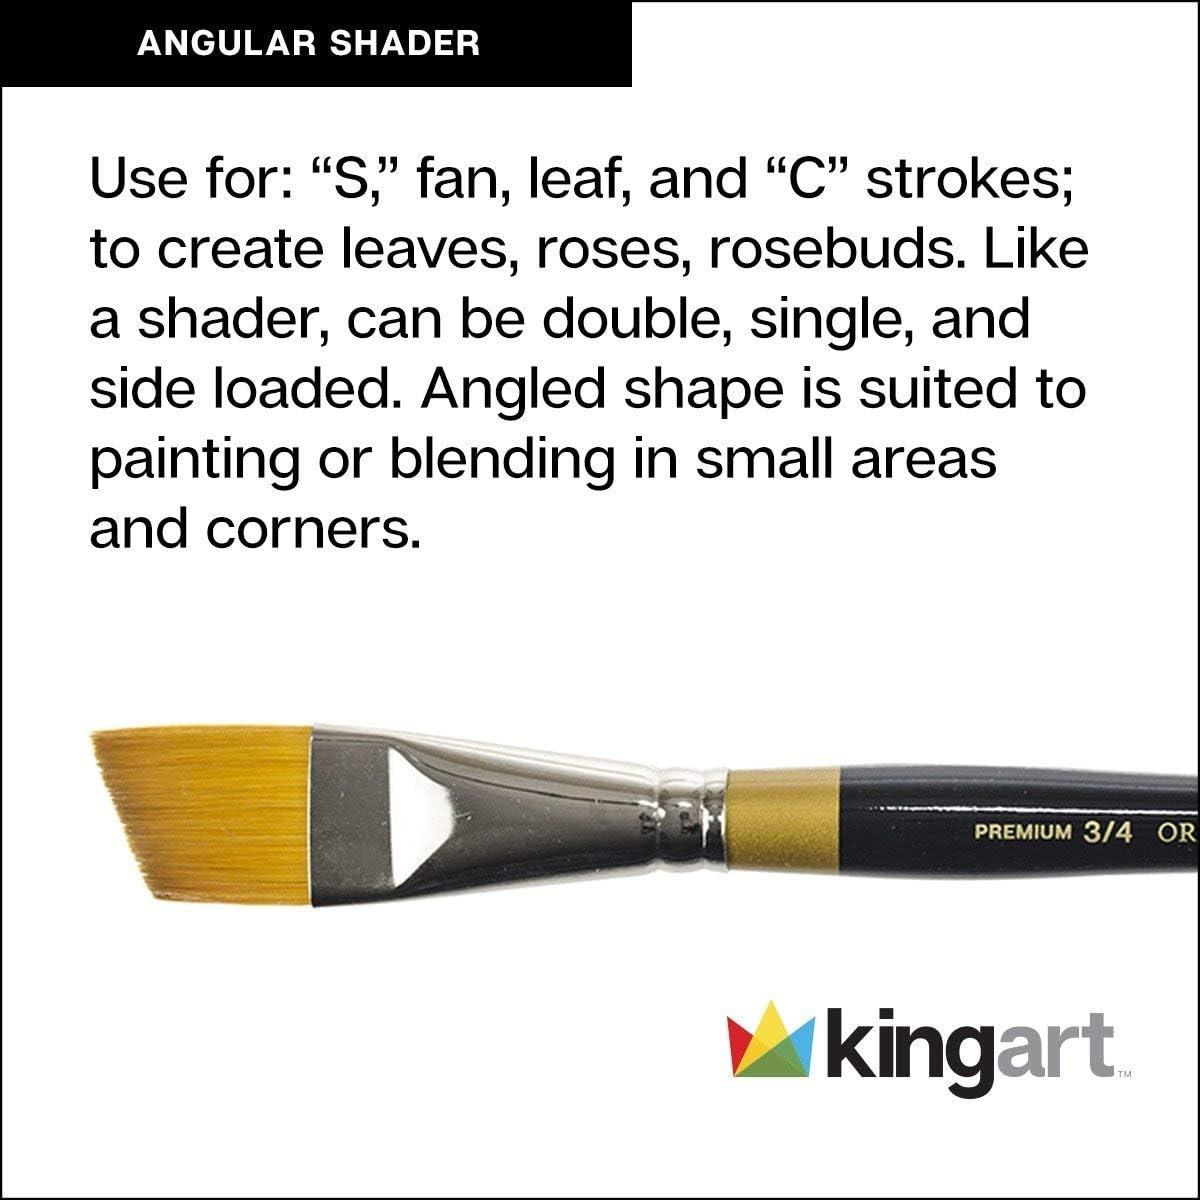 Size 5//8 Black//Gold Golden Taklon Angular Shader KINGART 9400-5//8 Original 9400 Series